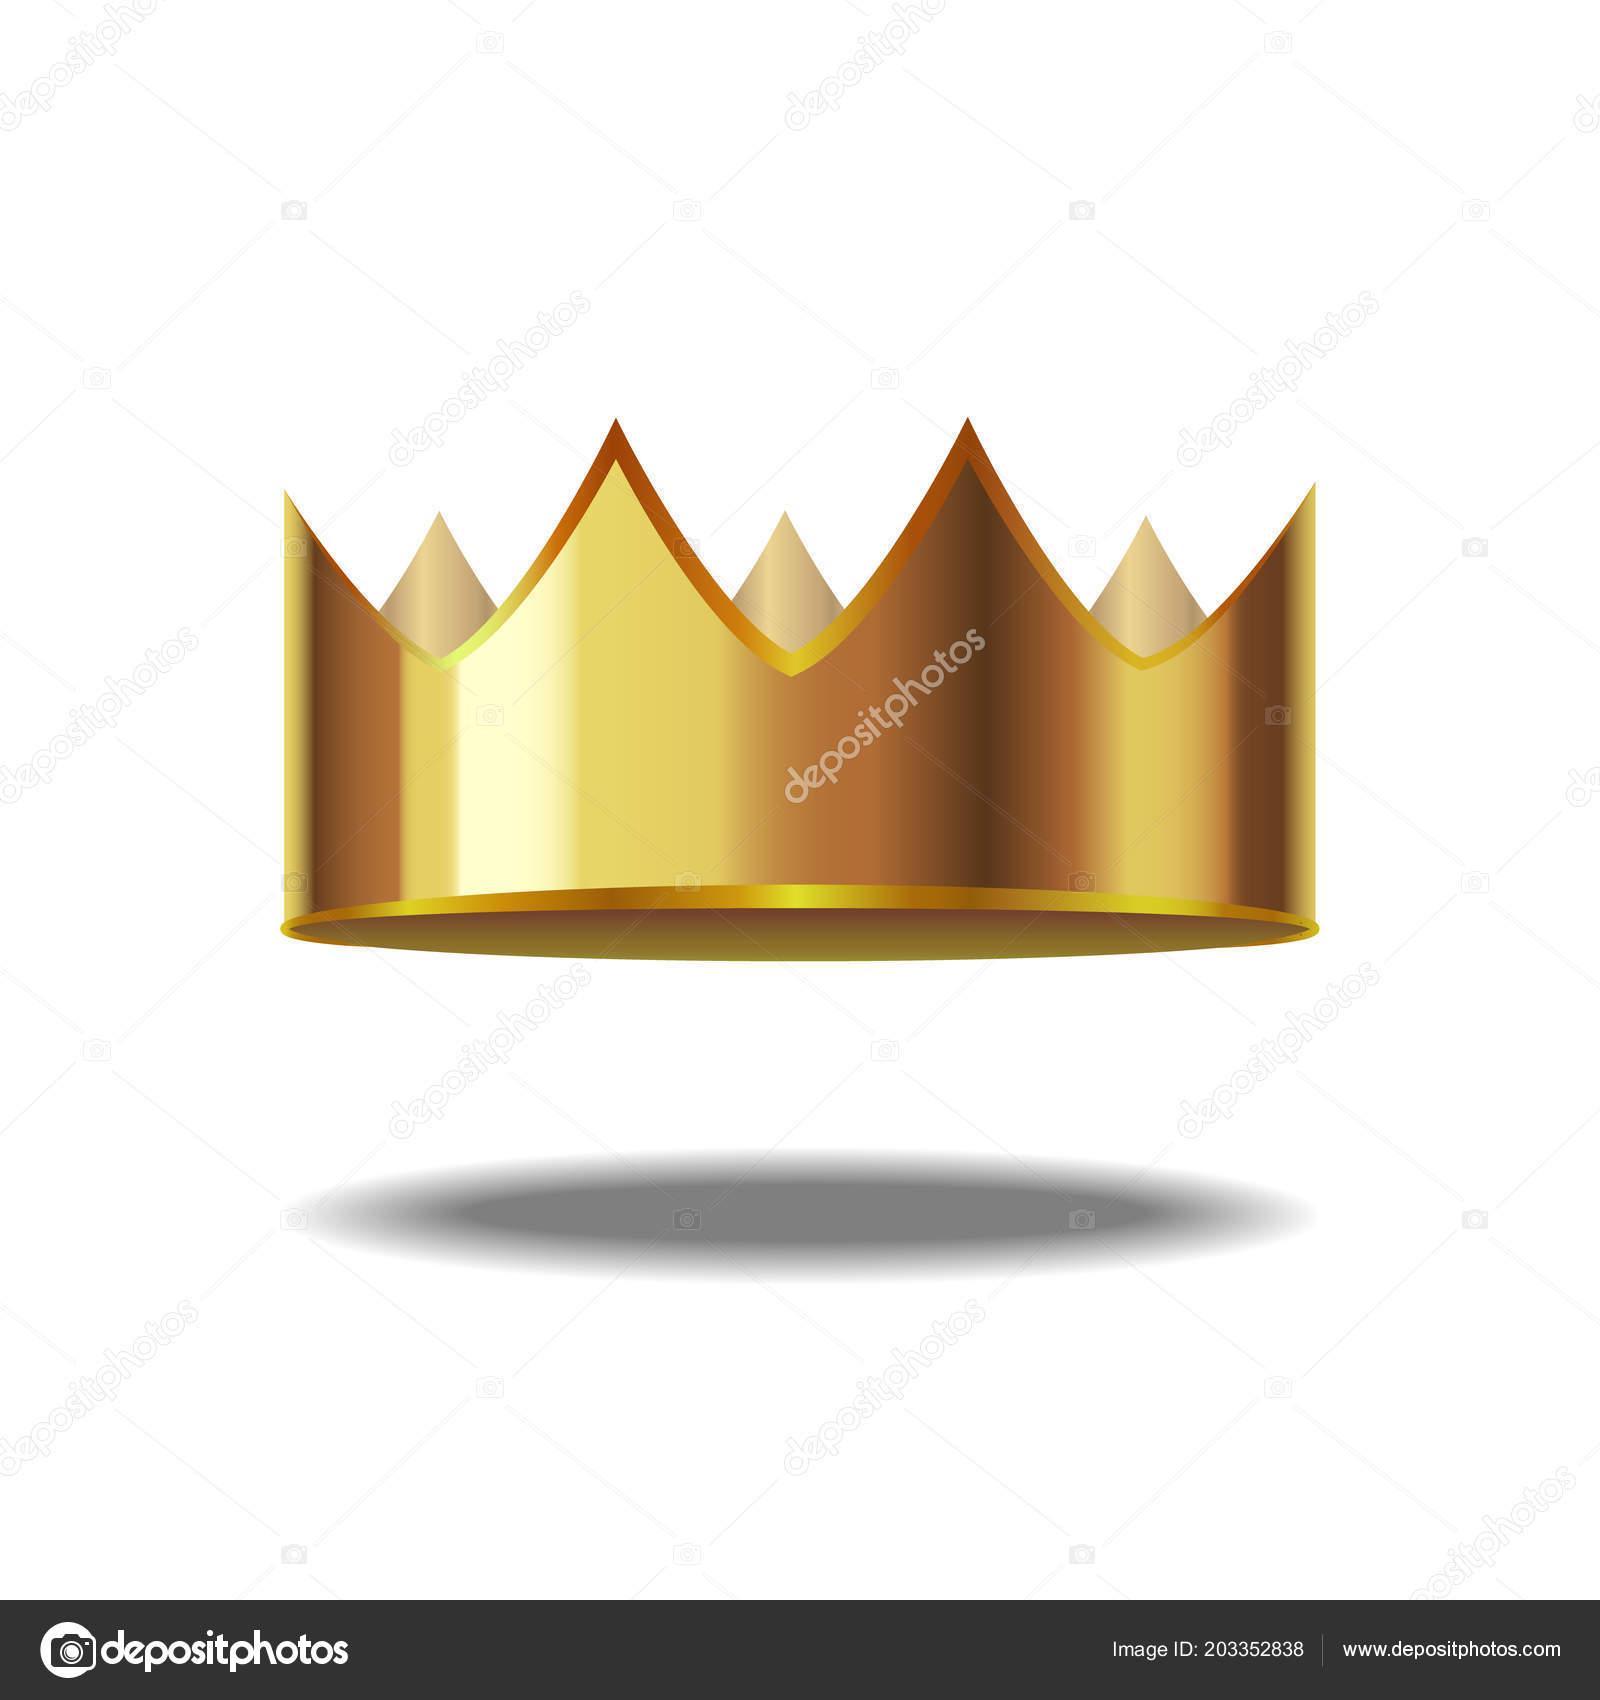 Realistic Detailed 3d Golden Crown Vector